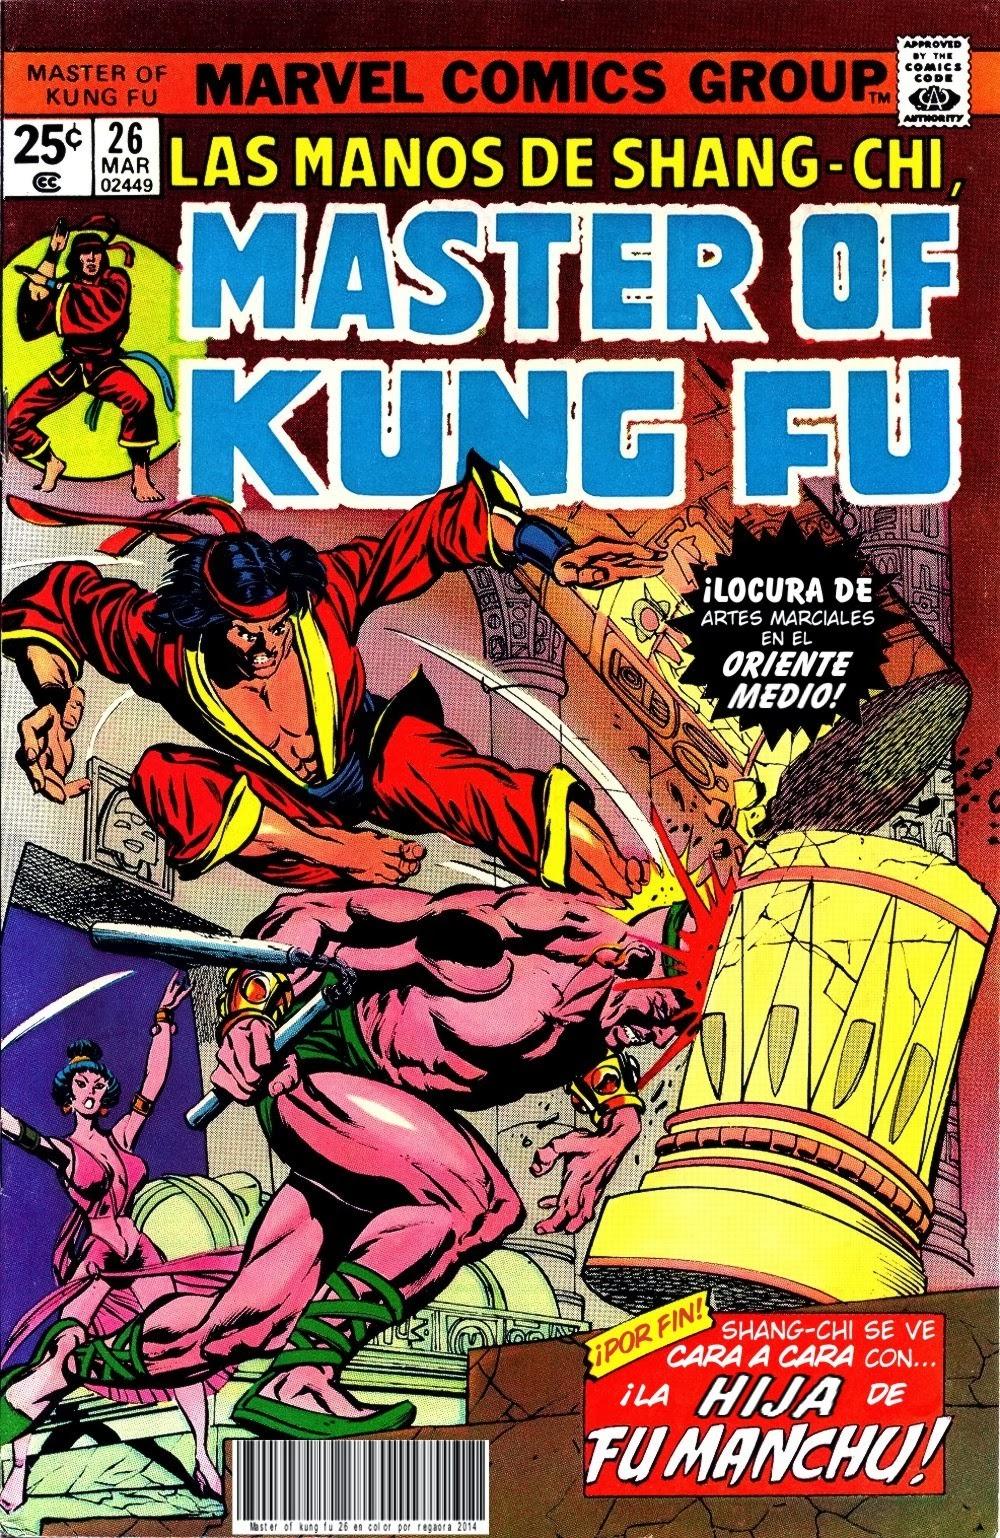 Portada de Master of Kung Fu Nº 26 traducido